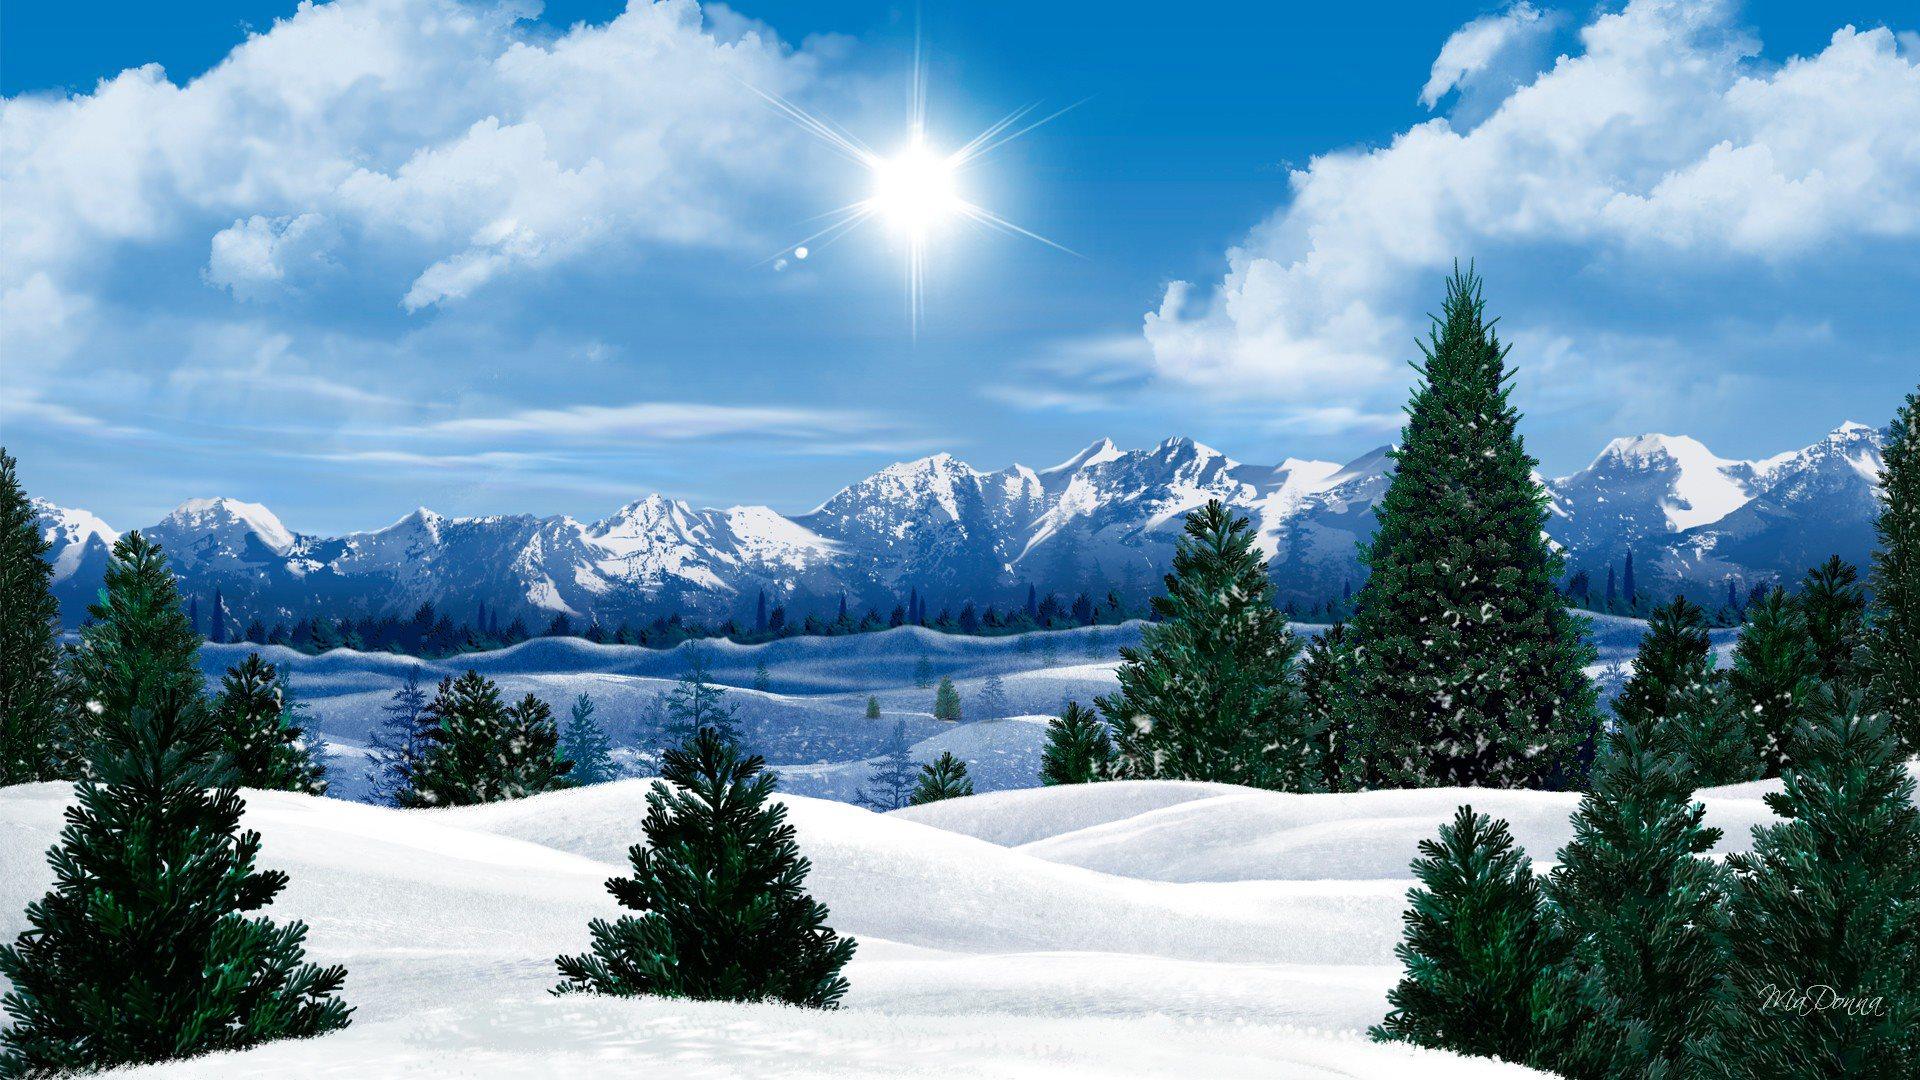 Apple Iphone 8 Wallpaper Download Winter Morning Sun Wallpaper 1920x1080